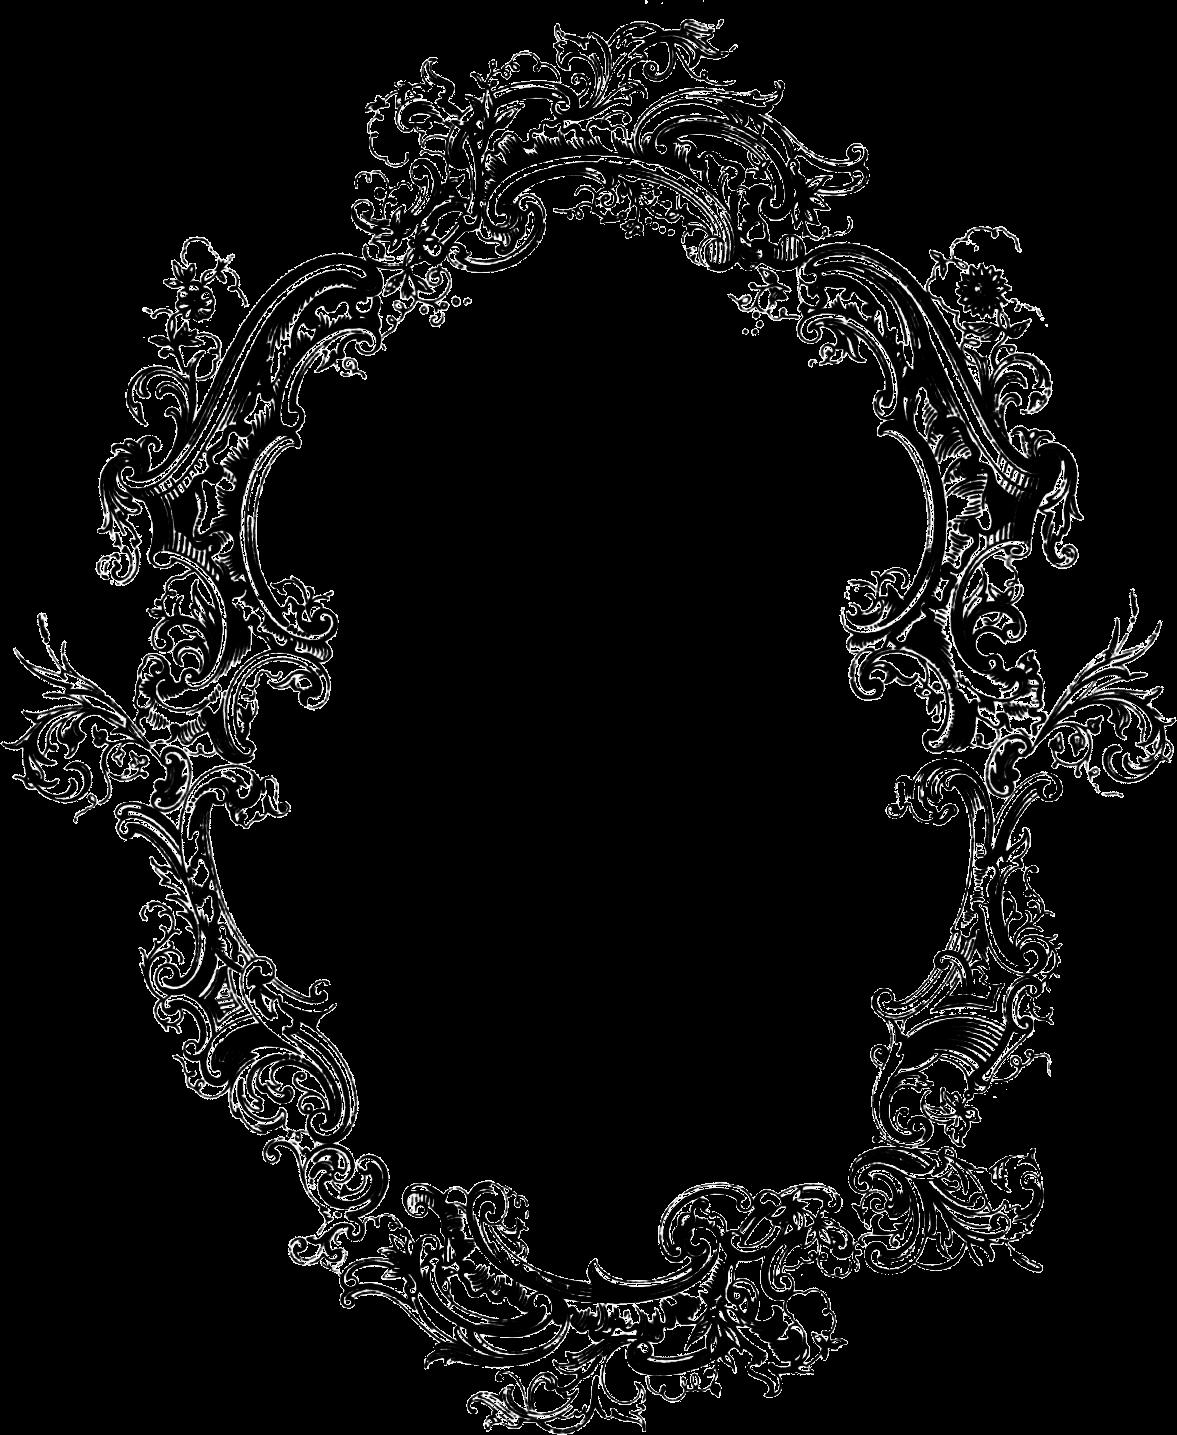 Wreath clipart victorian  Pinterest Frame Filigree Frame